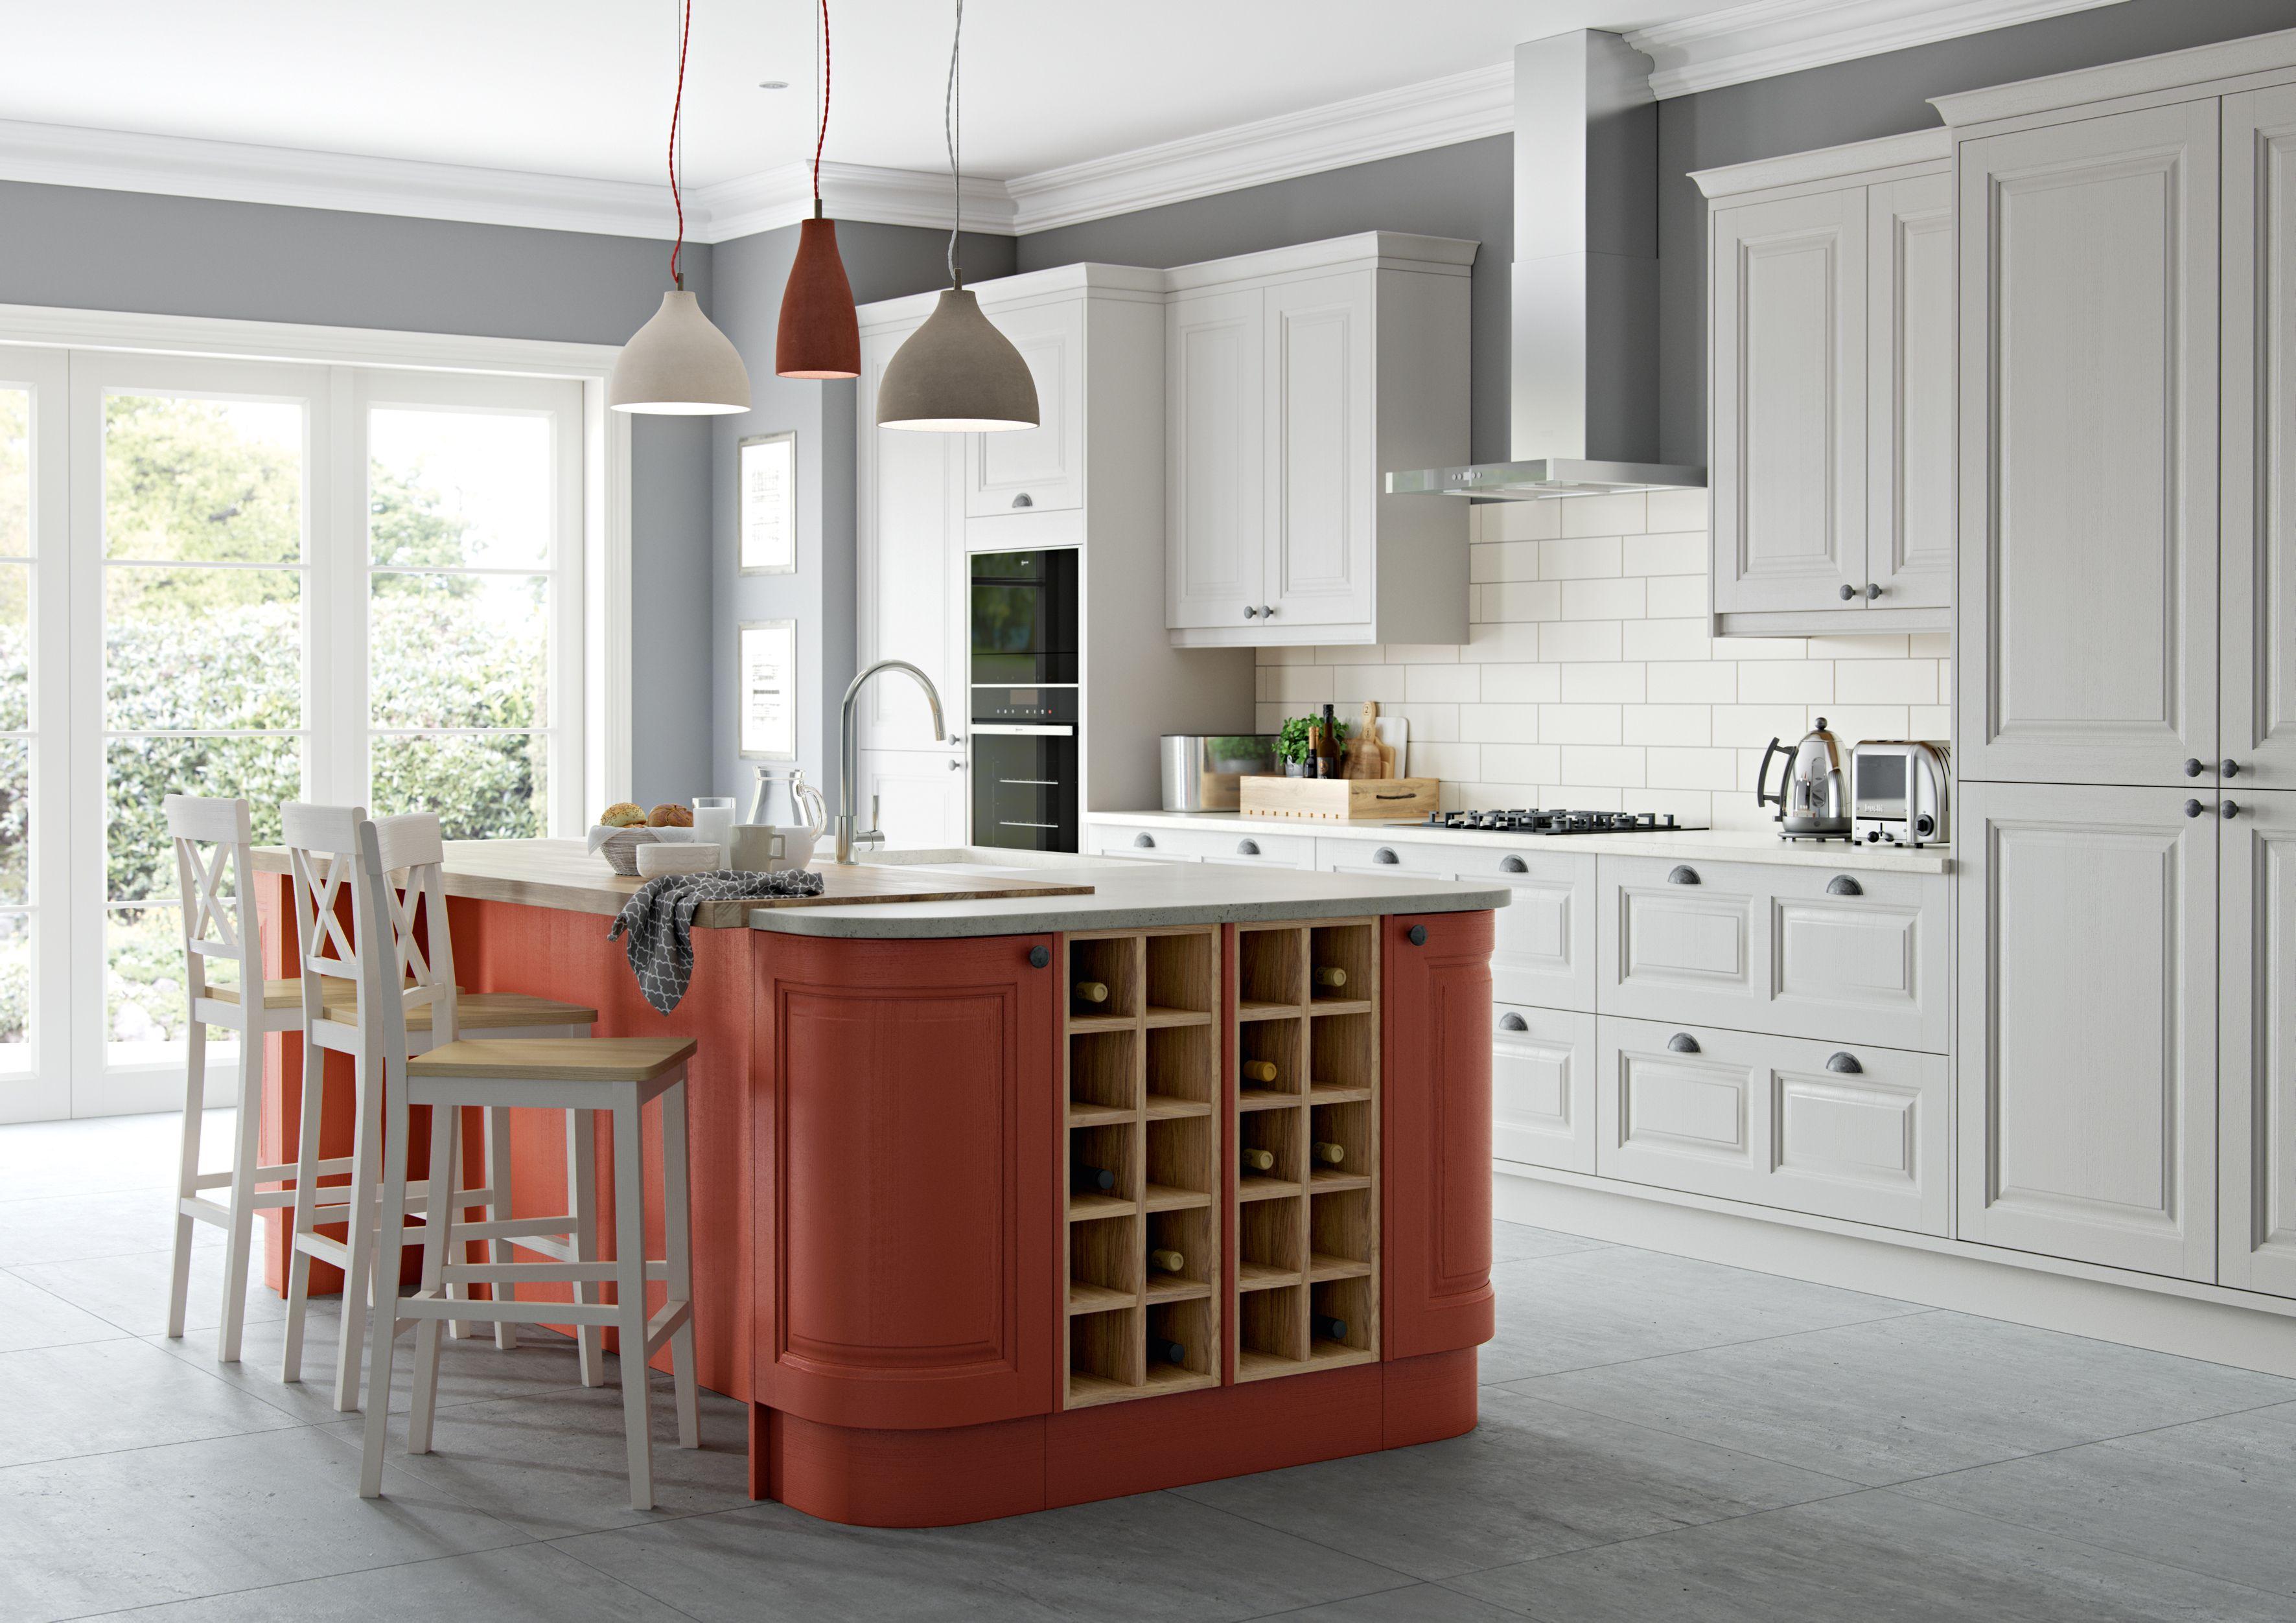 Breakfast Bar Ideas 6 Steps To Planning A Kitchen Breakfast Bar